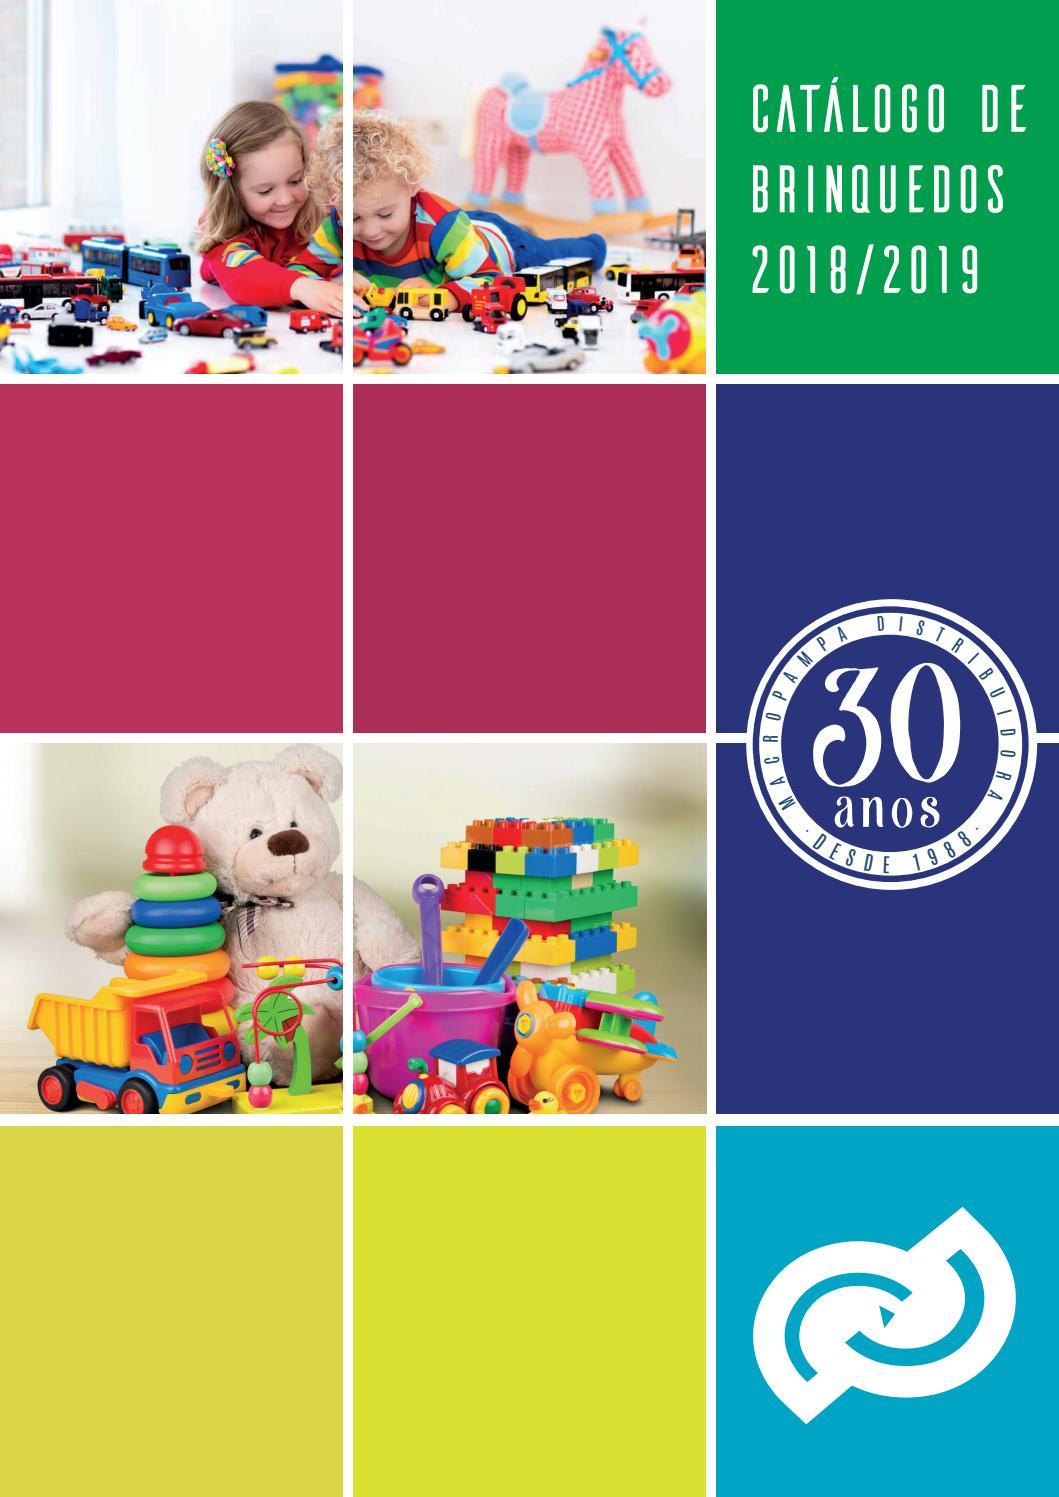 Catálogo Brinquedos by Macropampa - issuu 93e26c8deb658